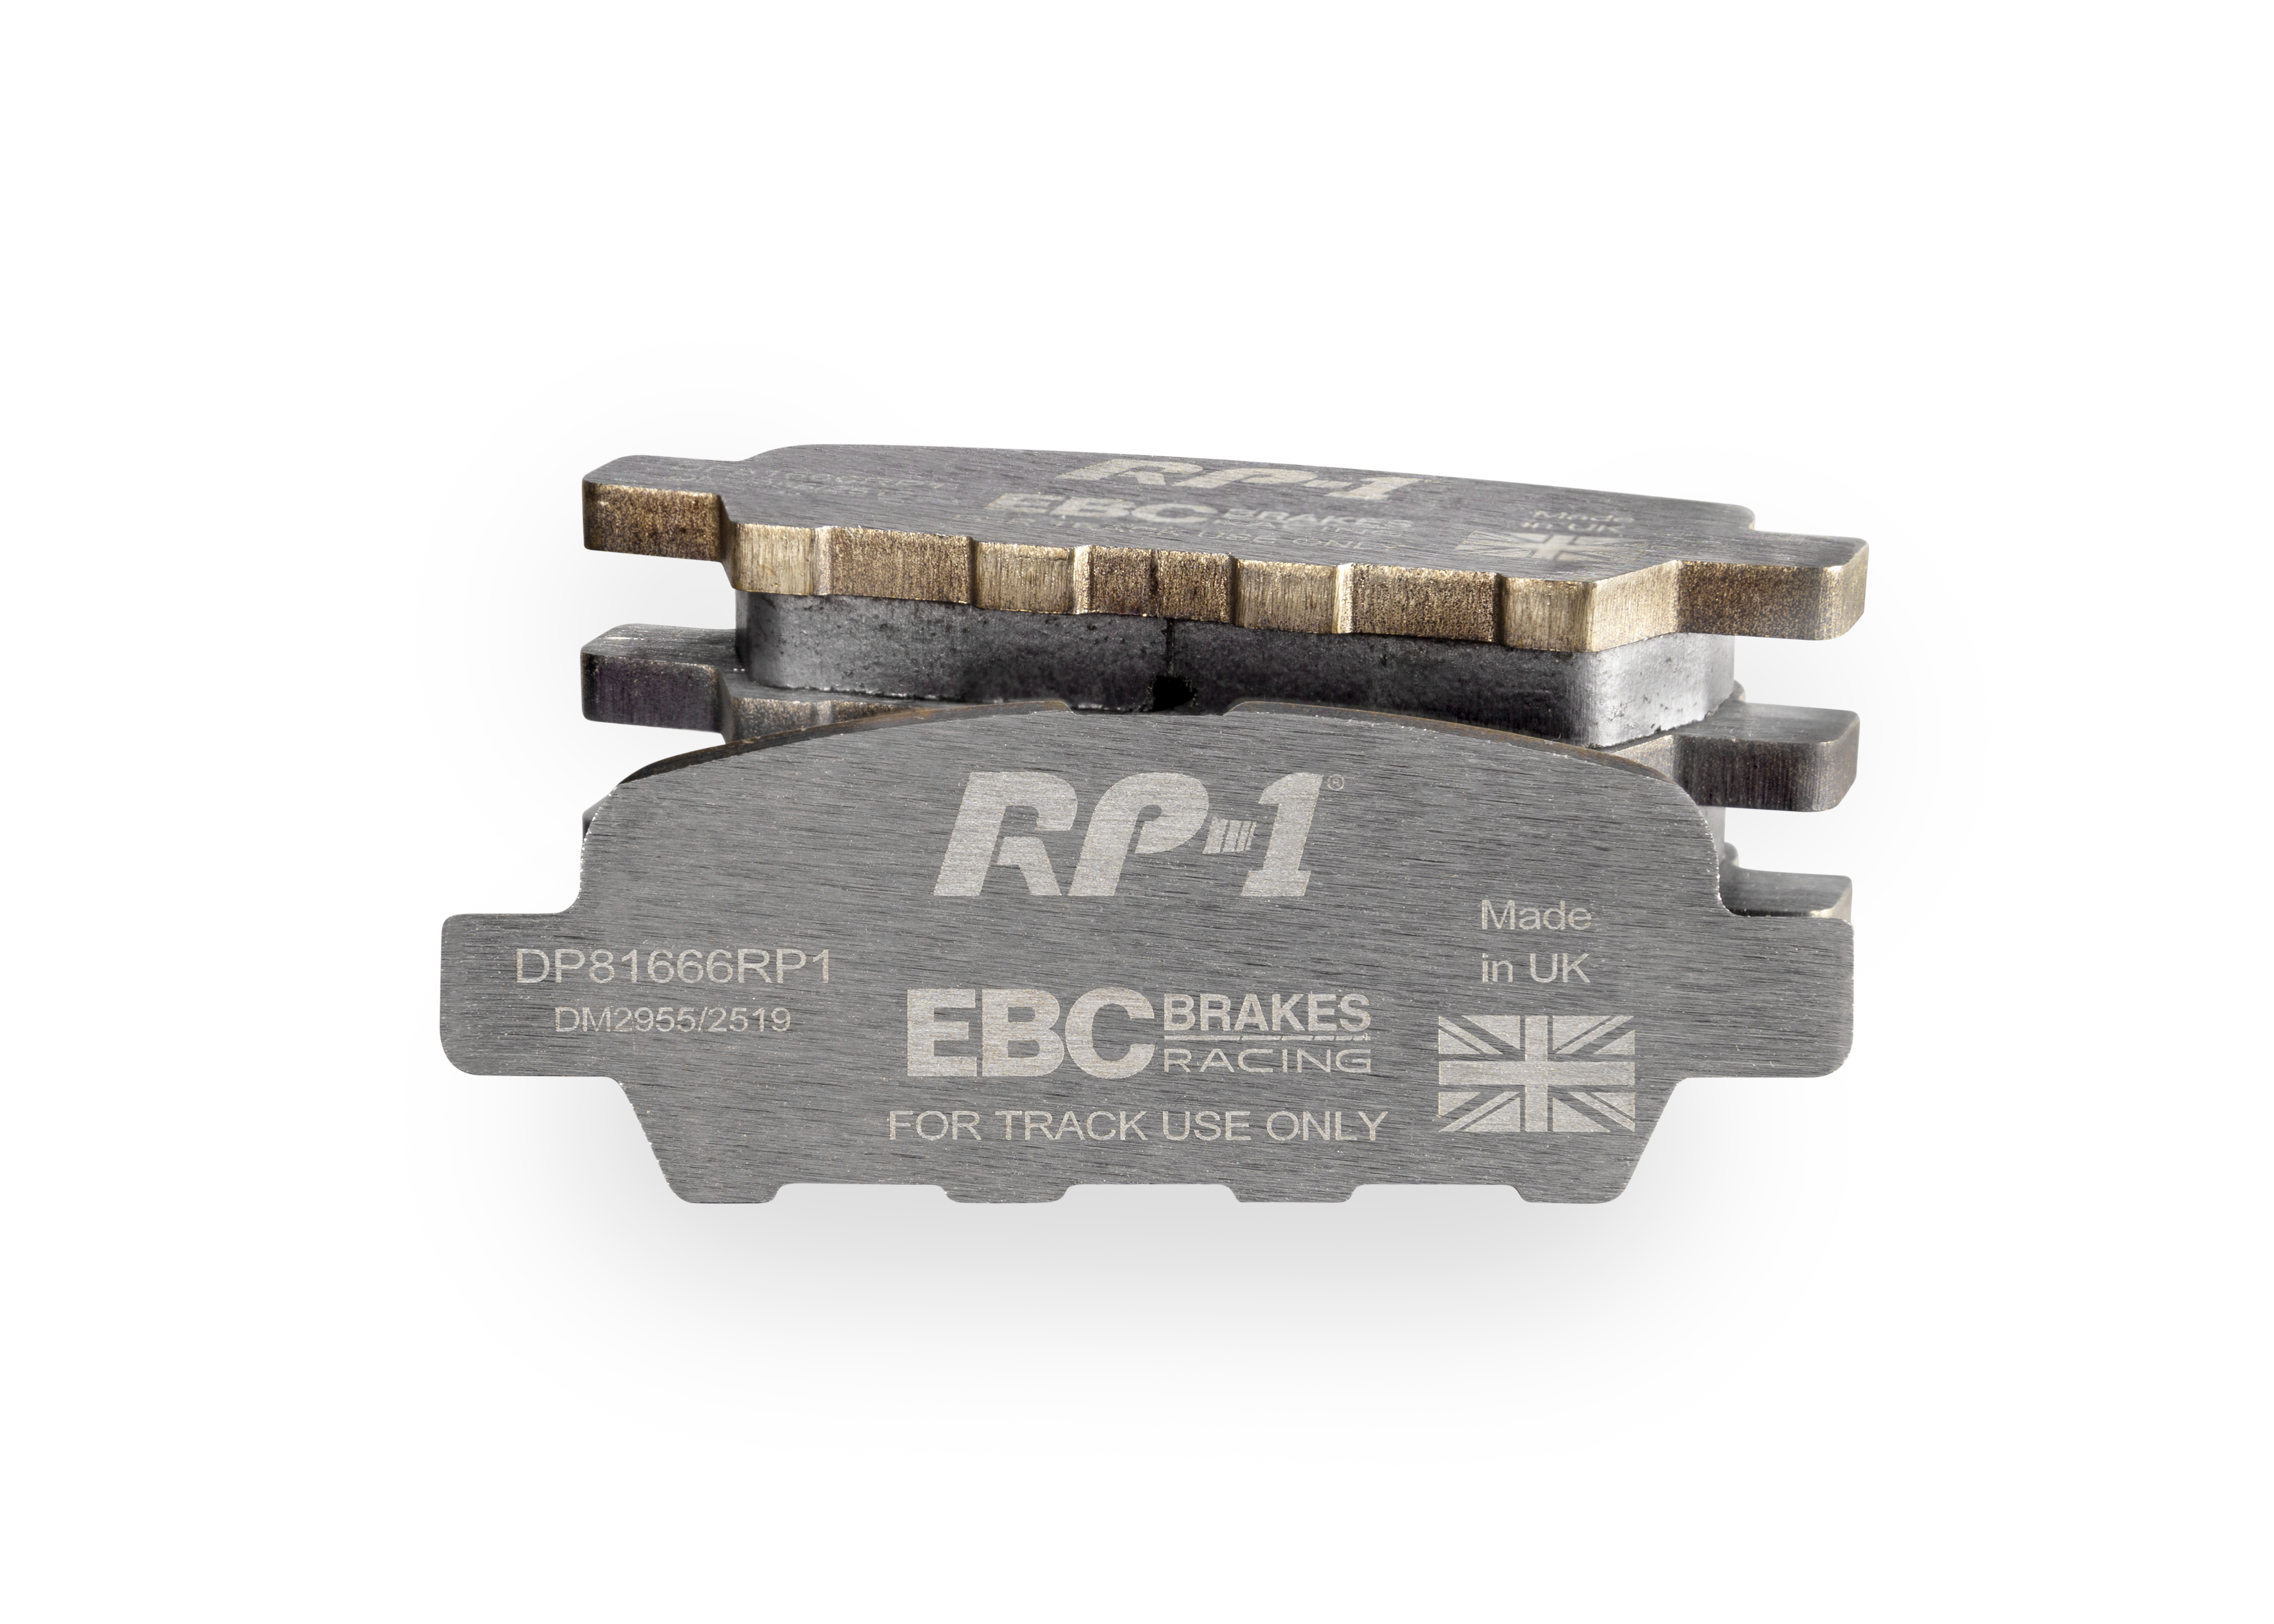 EBC Racing RP-1 Track and Race Brake Pads